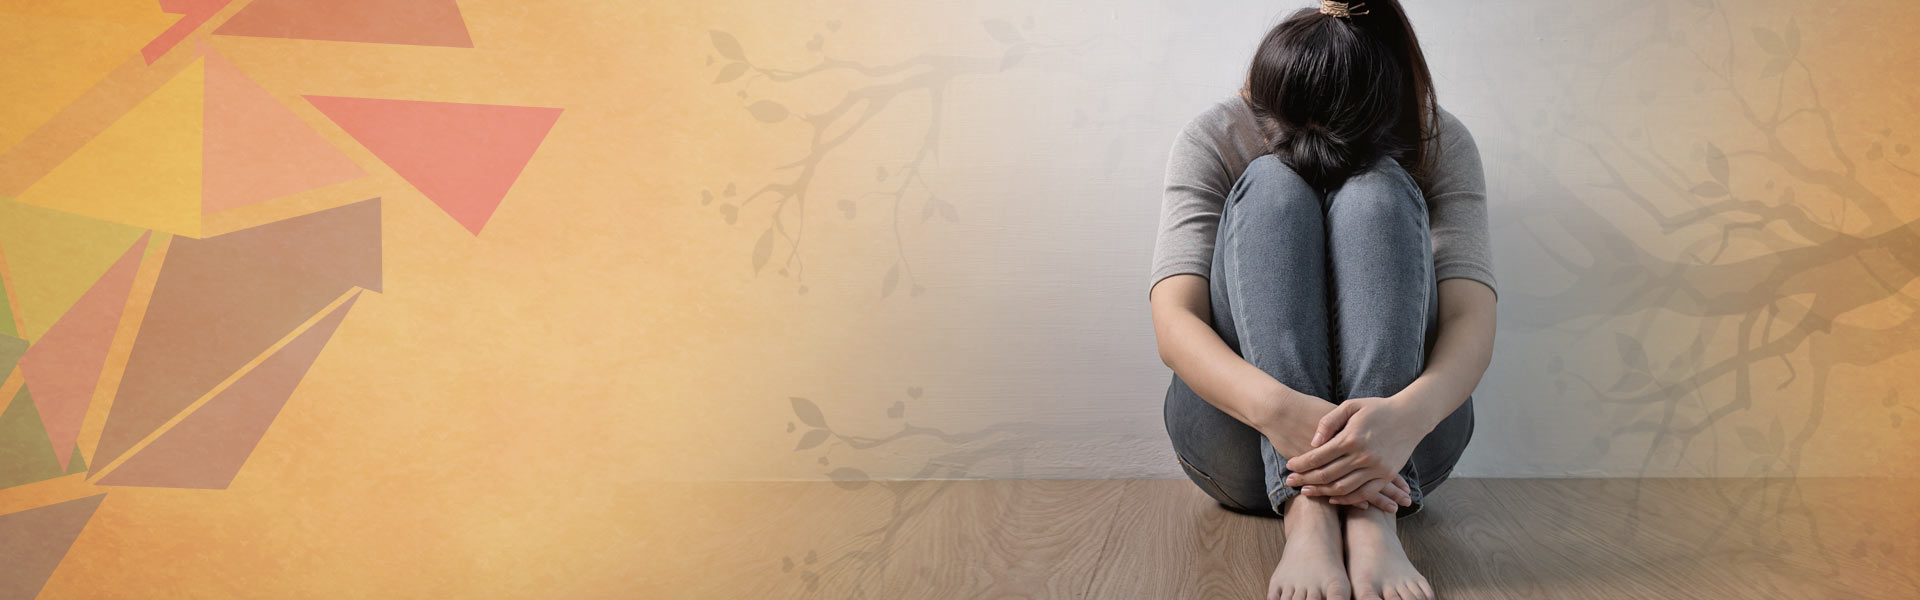 image showing depressed woman